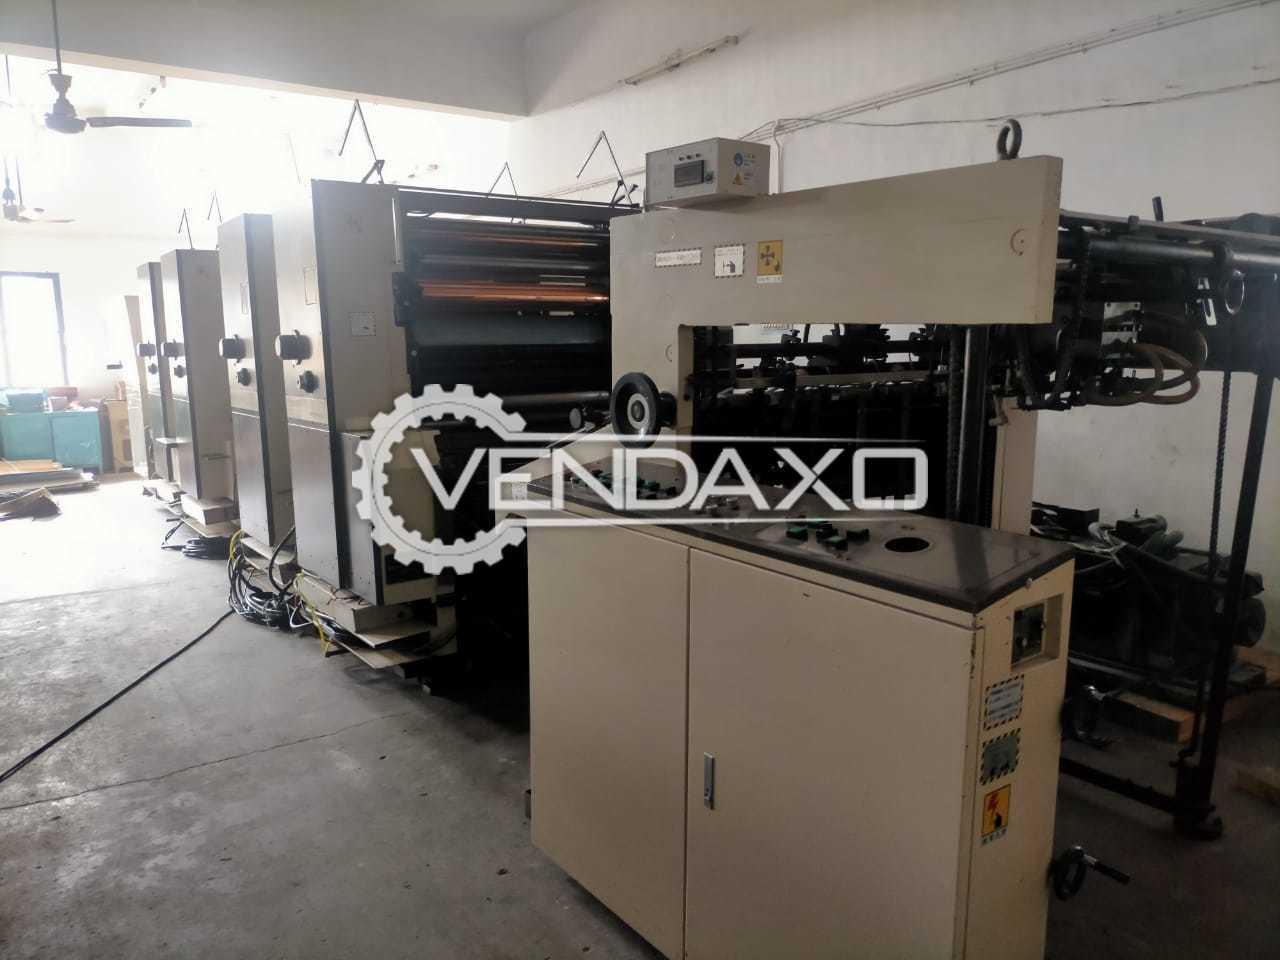 Mitsubishi Daiya 3F-4 Offset Printing Machine - 20 x 28 Inch, 4 Color